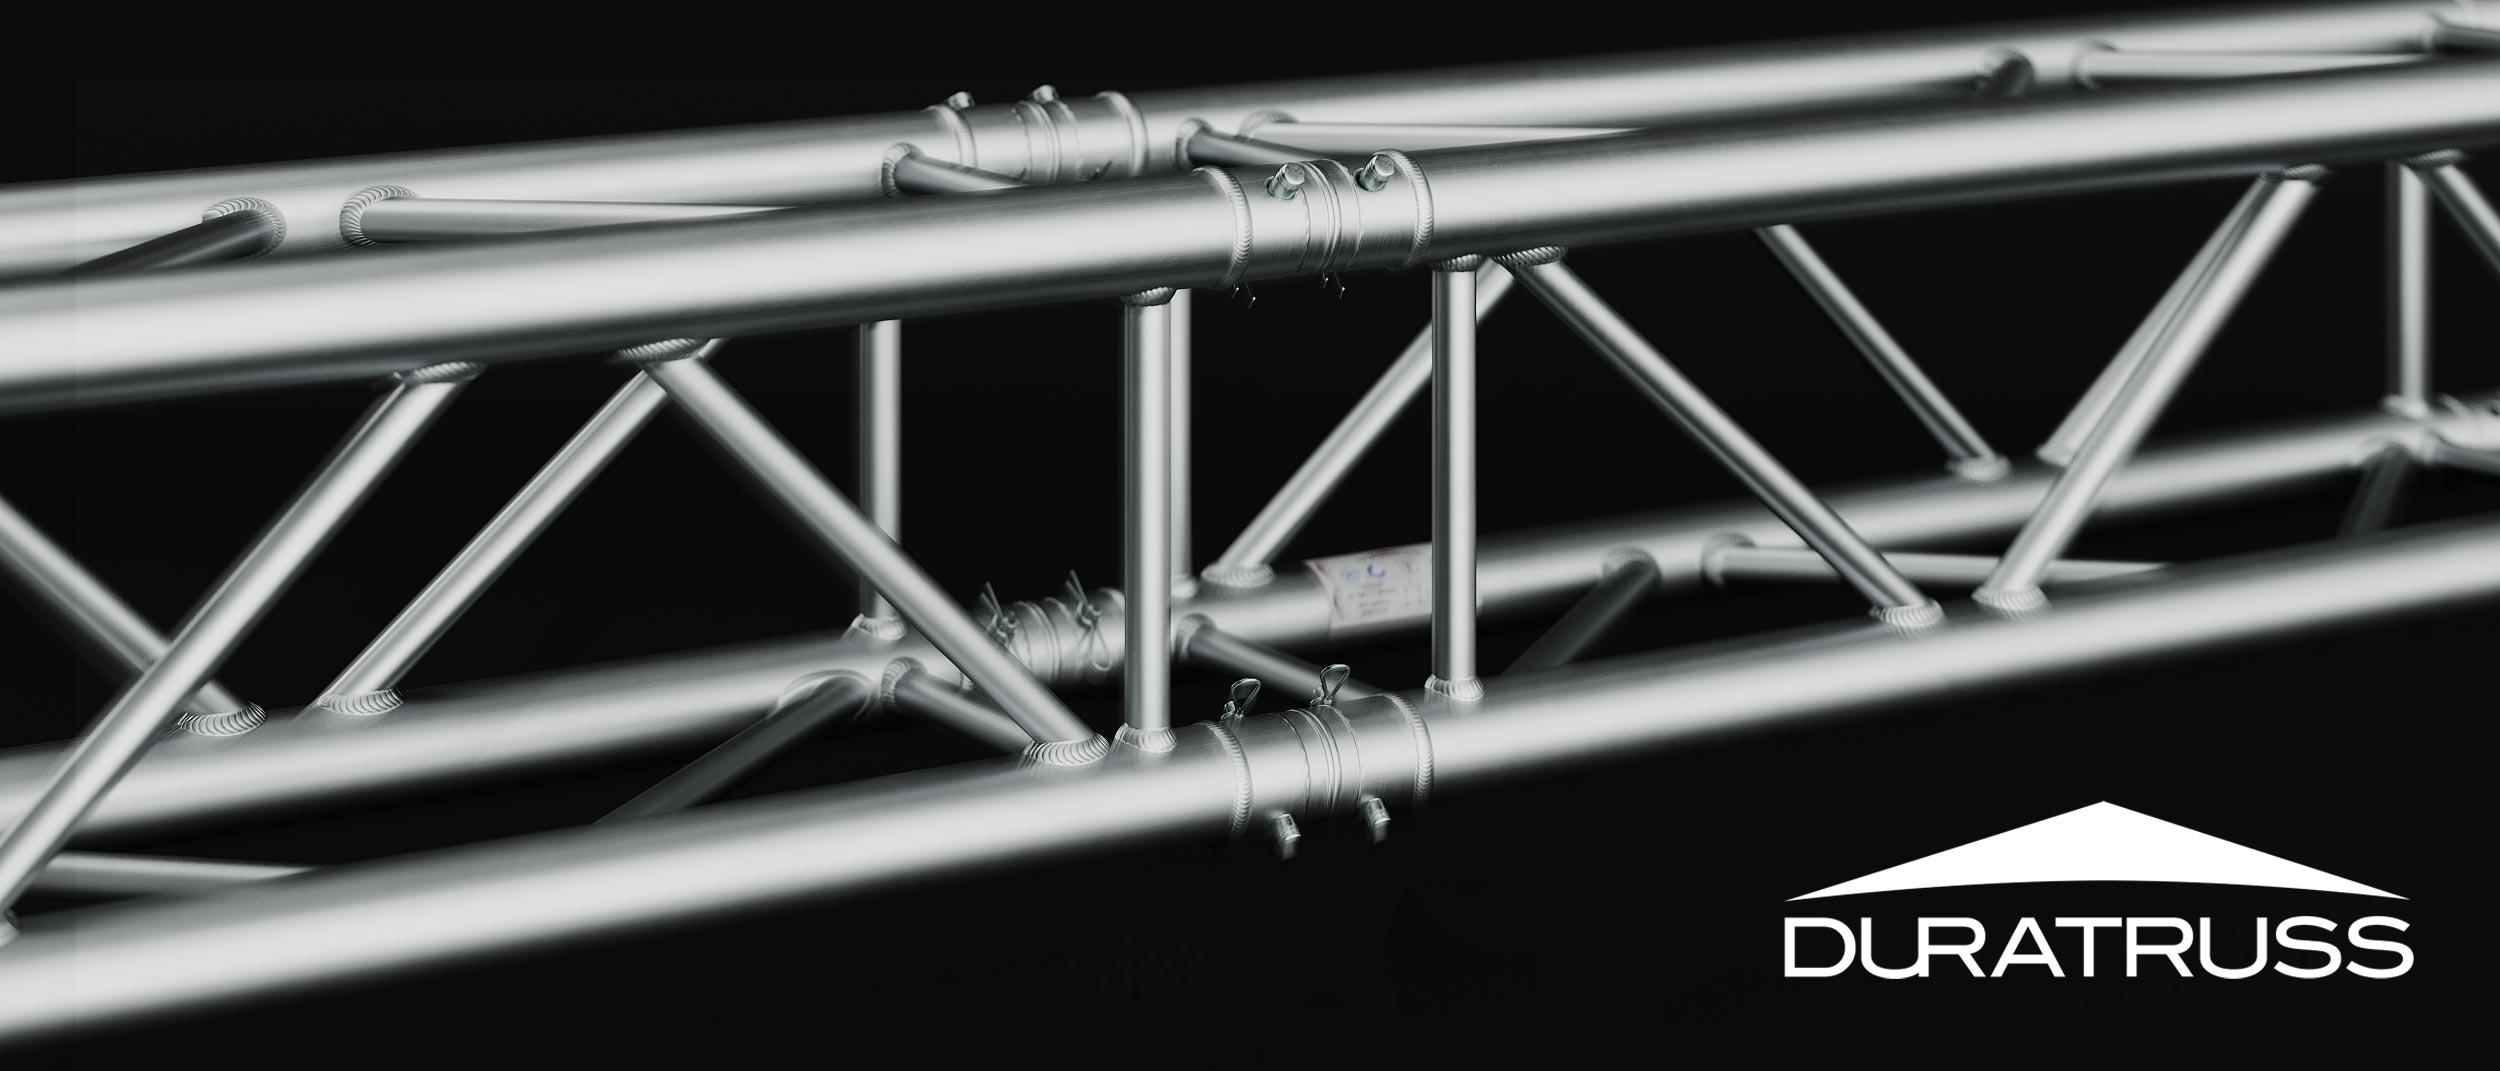 Trusslight Baner Kratownica Aluminiowa